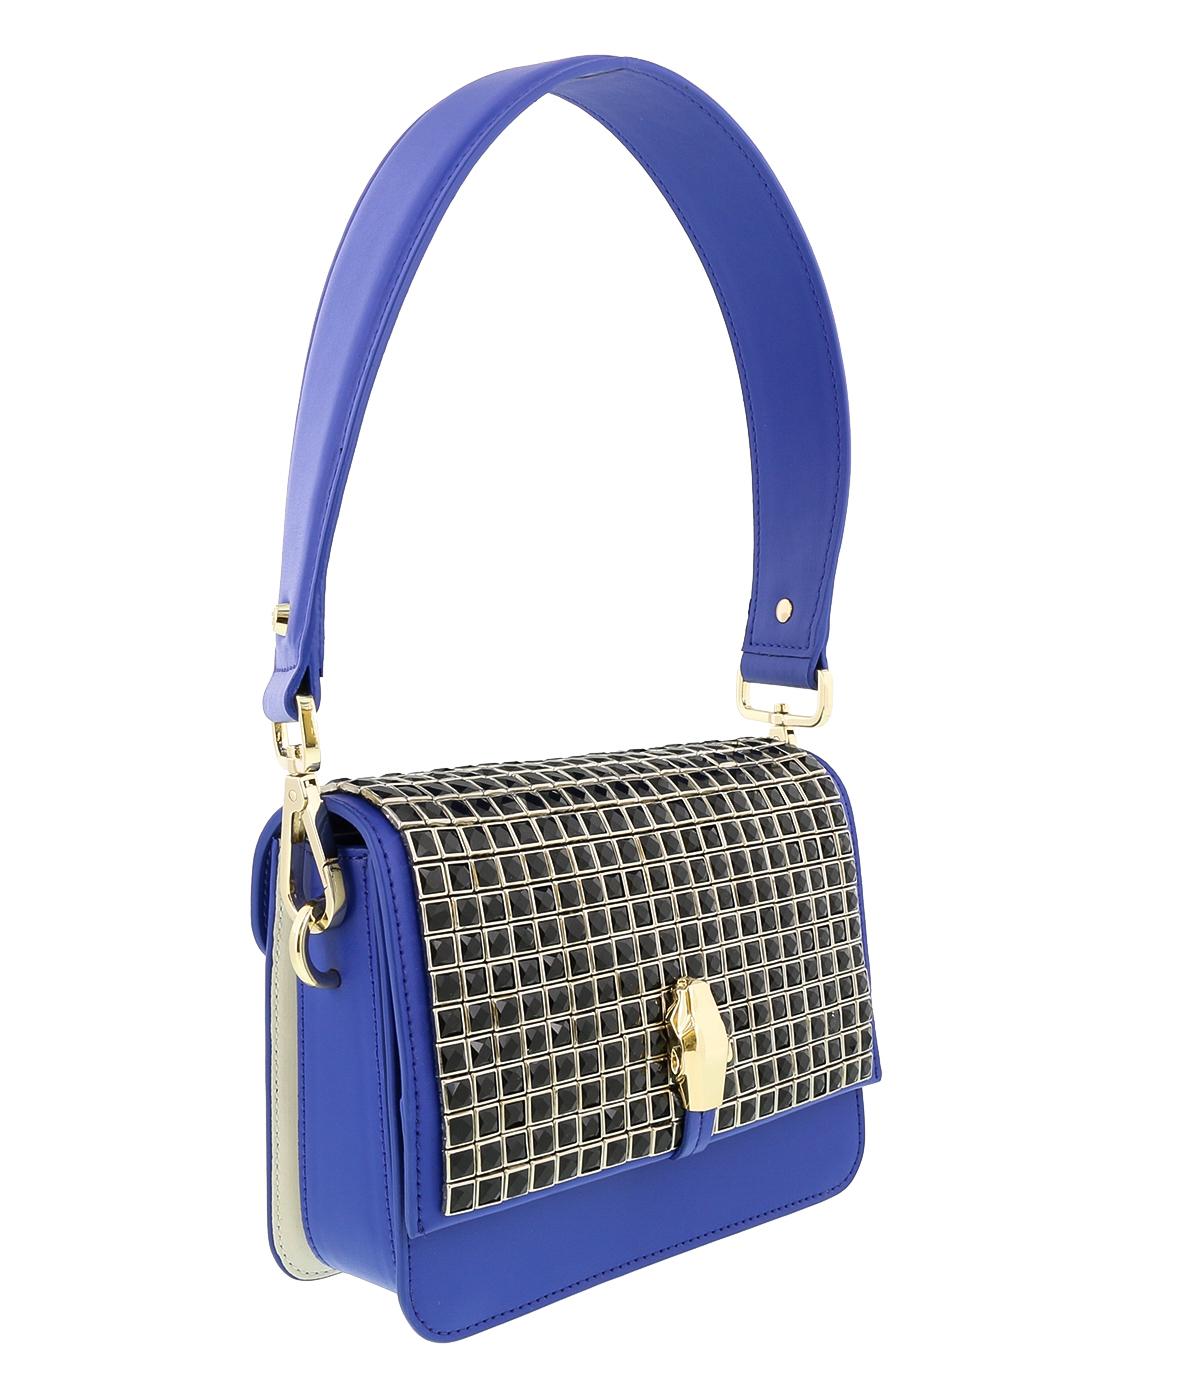 Class Roberto Cavalli Milano 008 Royal Blue/Black Medium Shoulder Bag